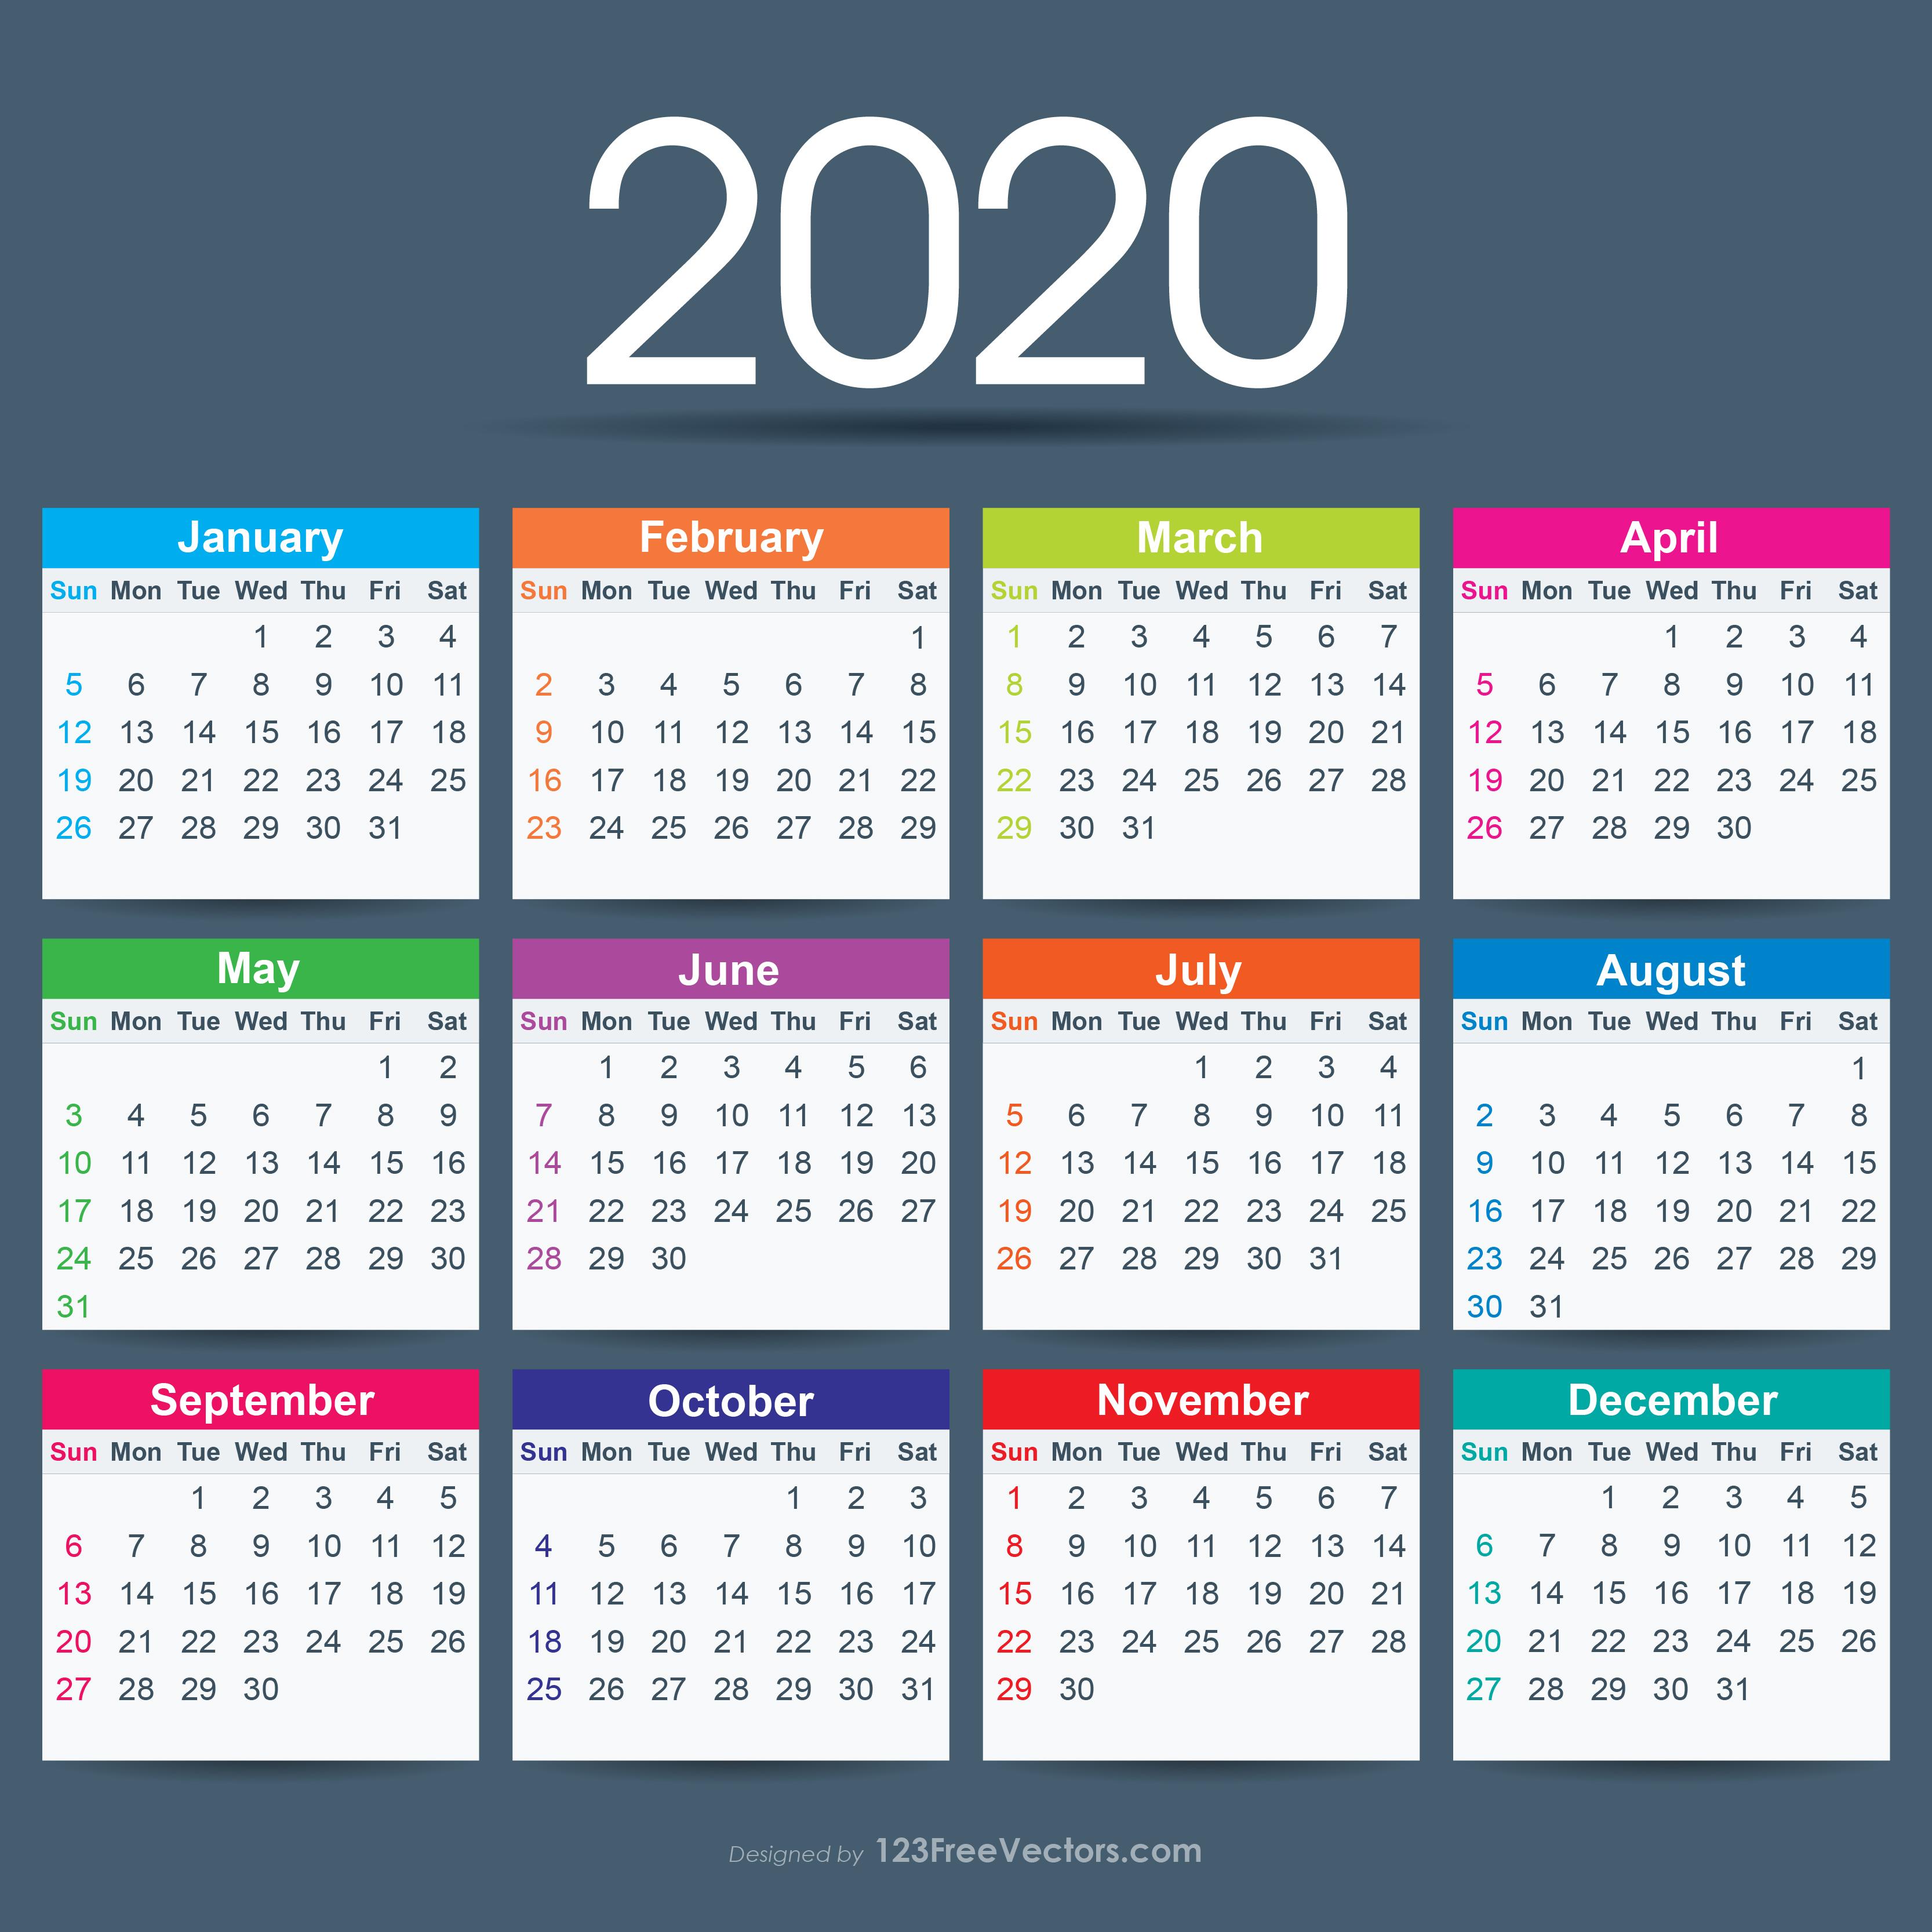 172143-2020-calendar-ai (1)